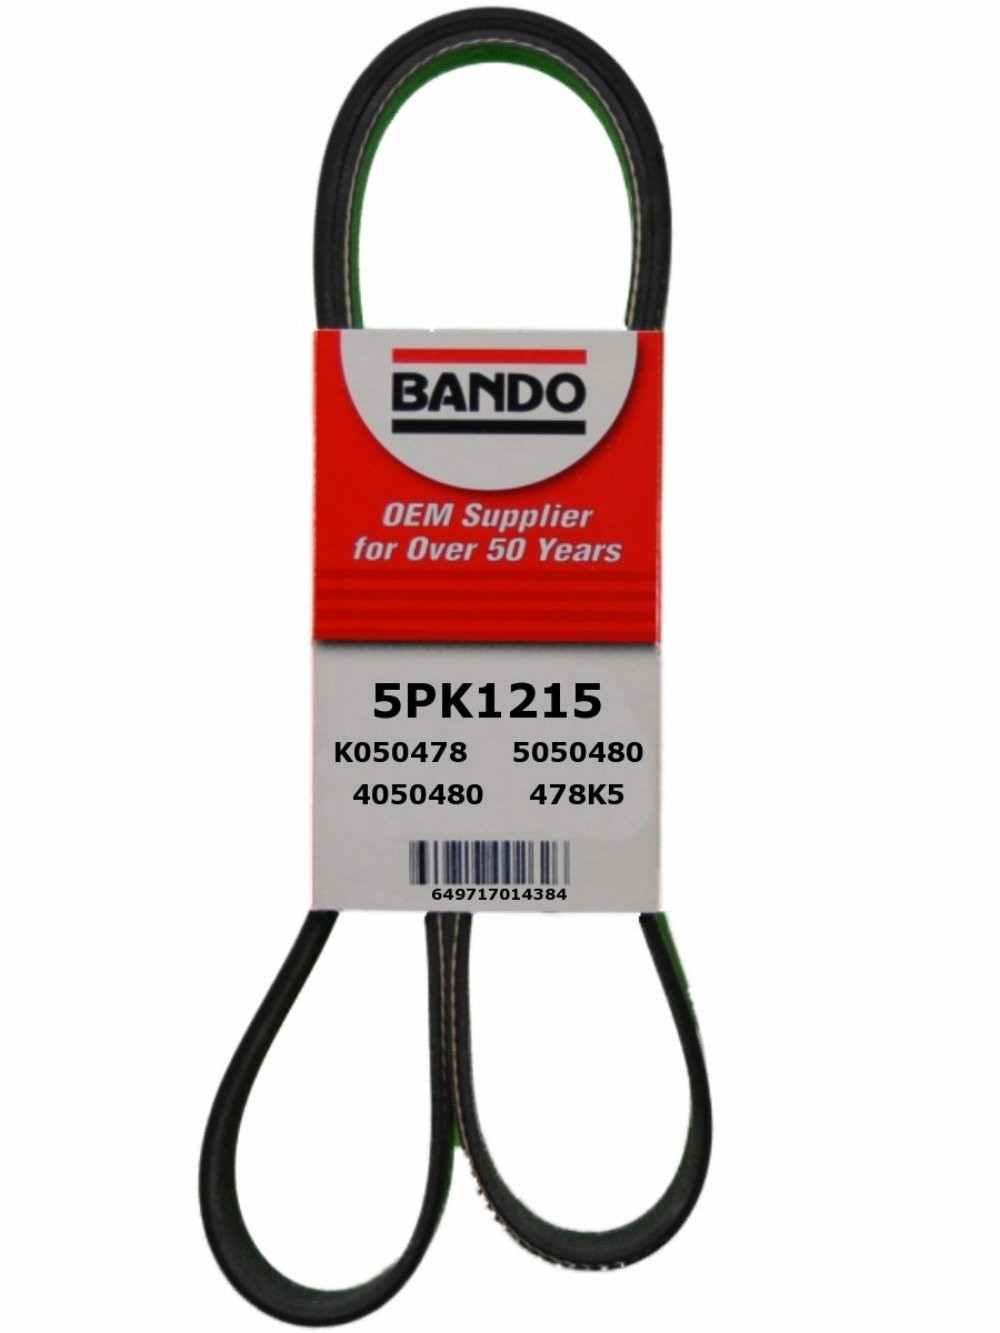 BANDO - Serpentine Belt - BWO 5PK1215